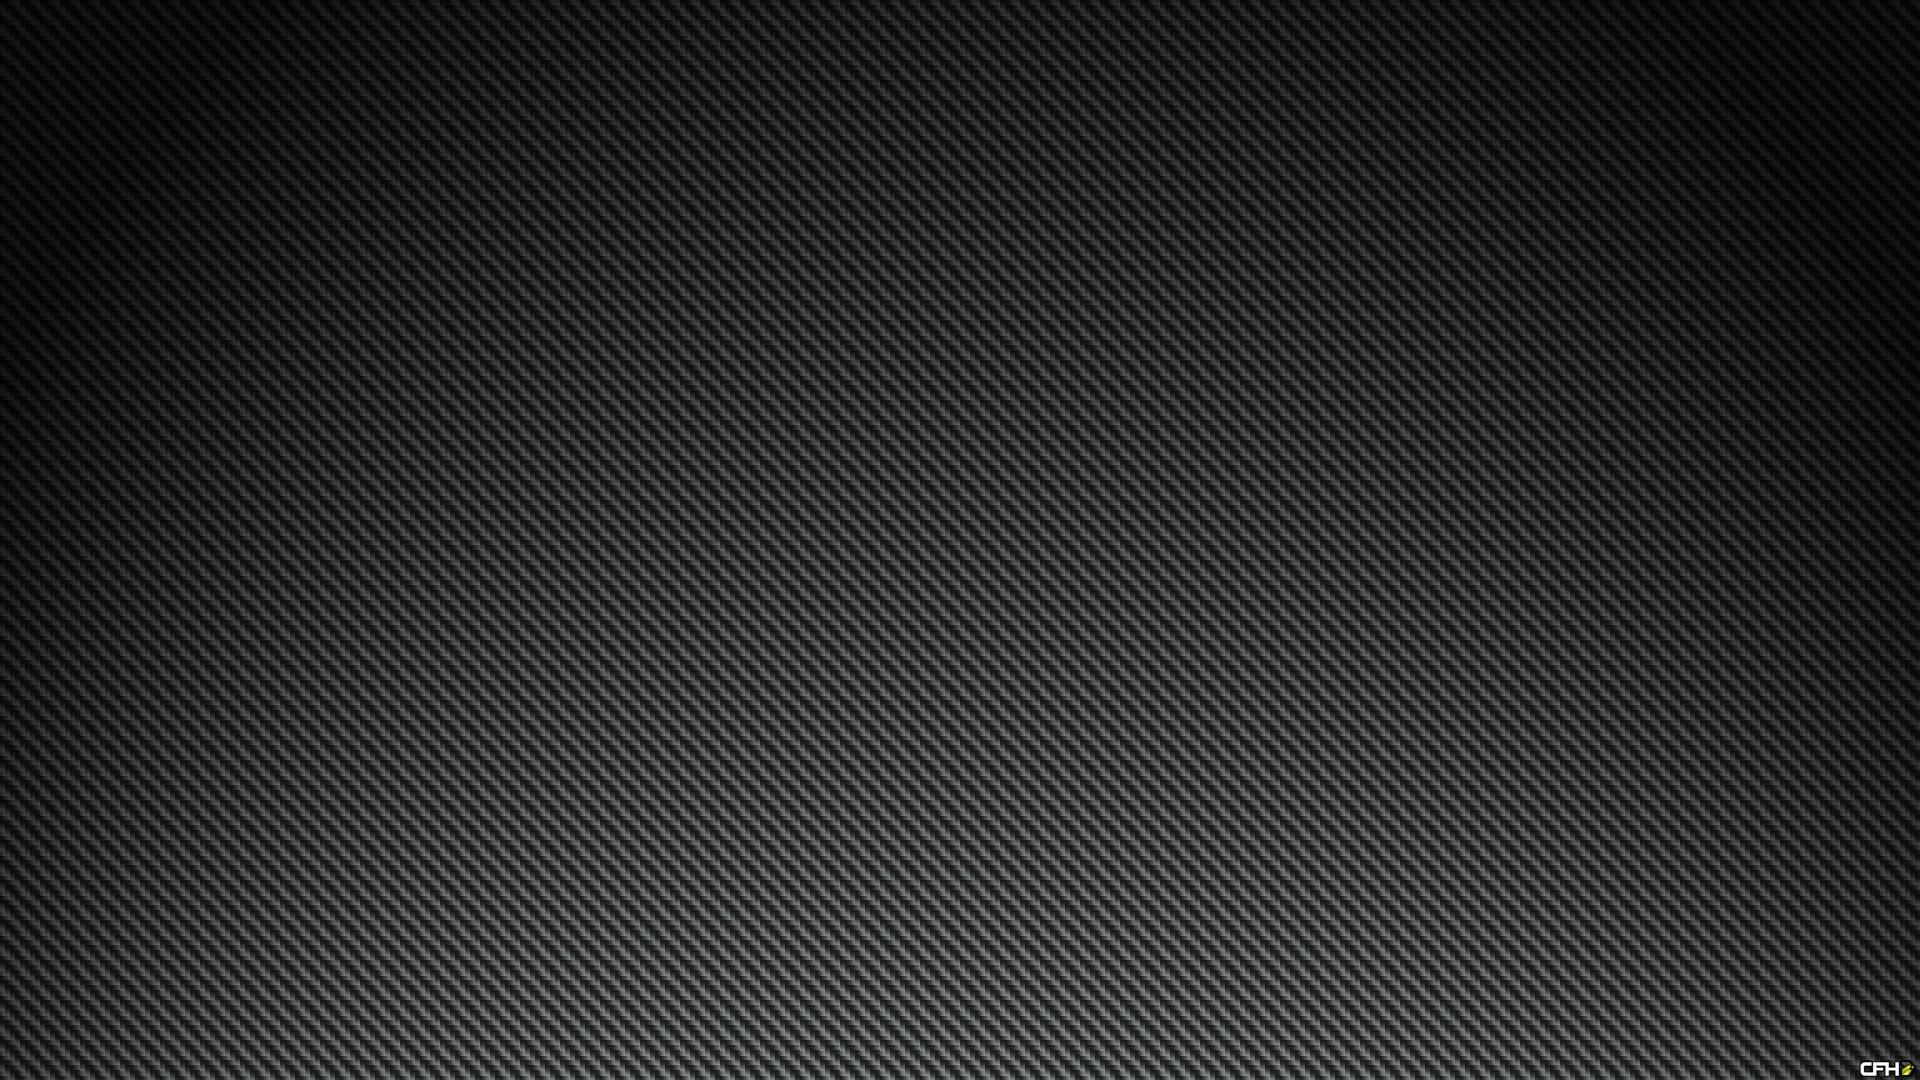 carbon fiber wallpapers group (72+)